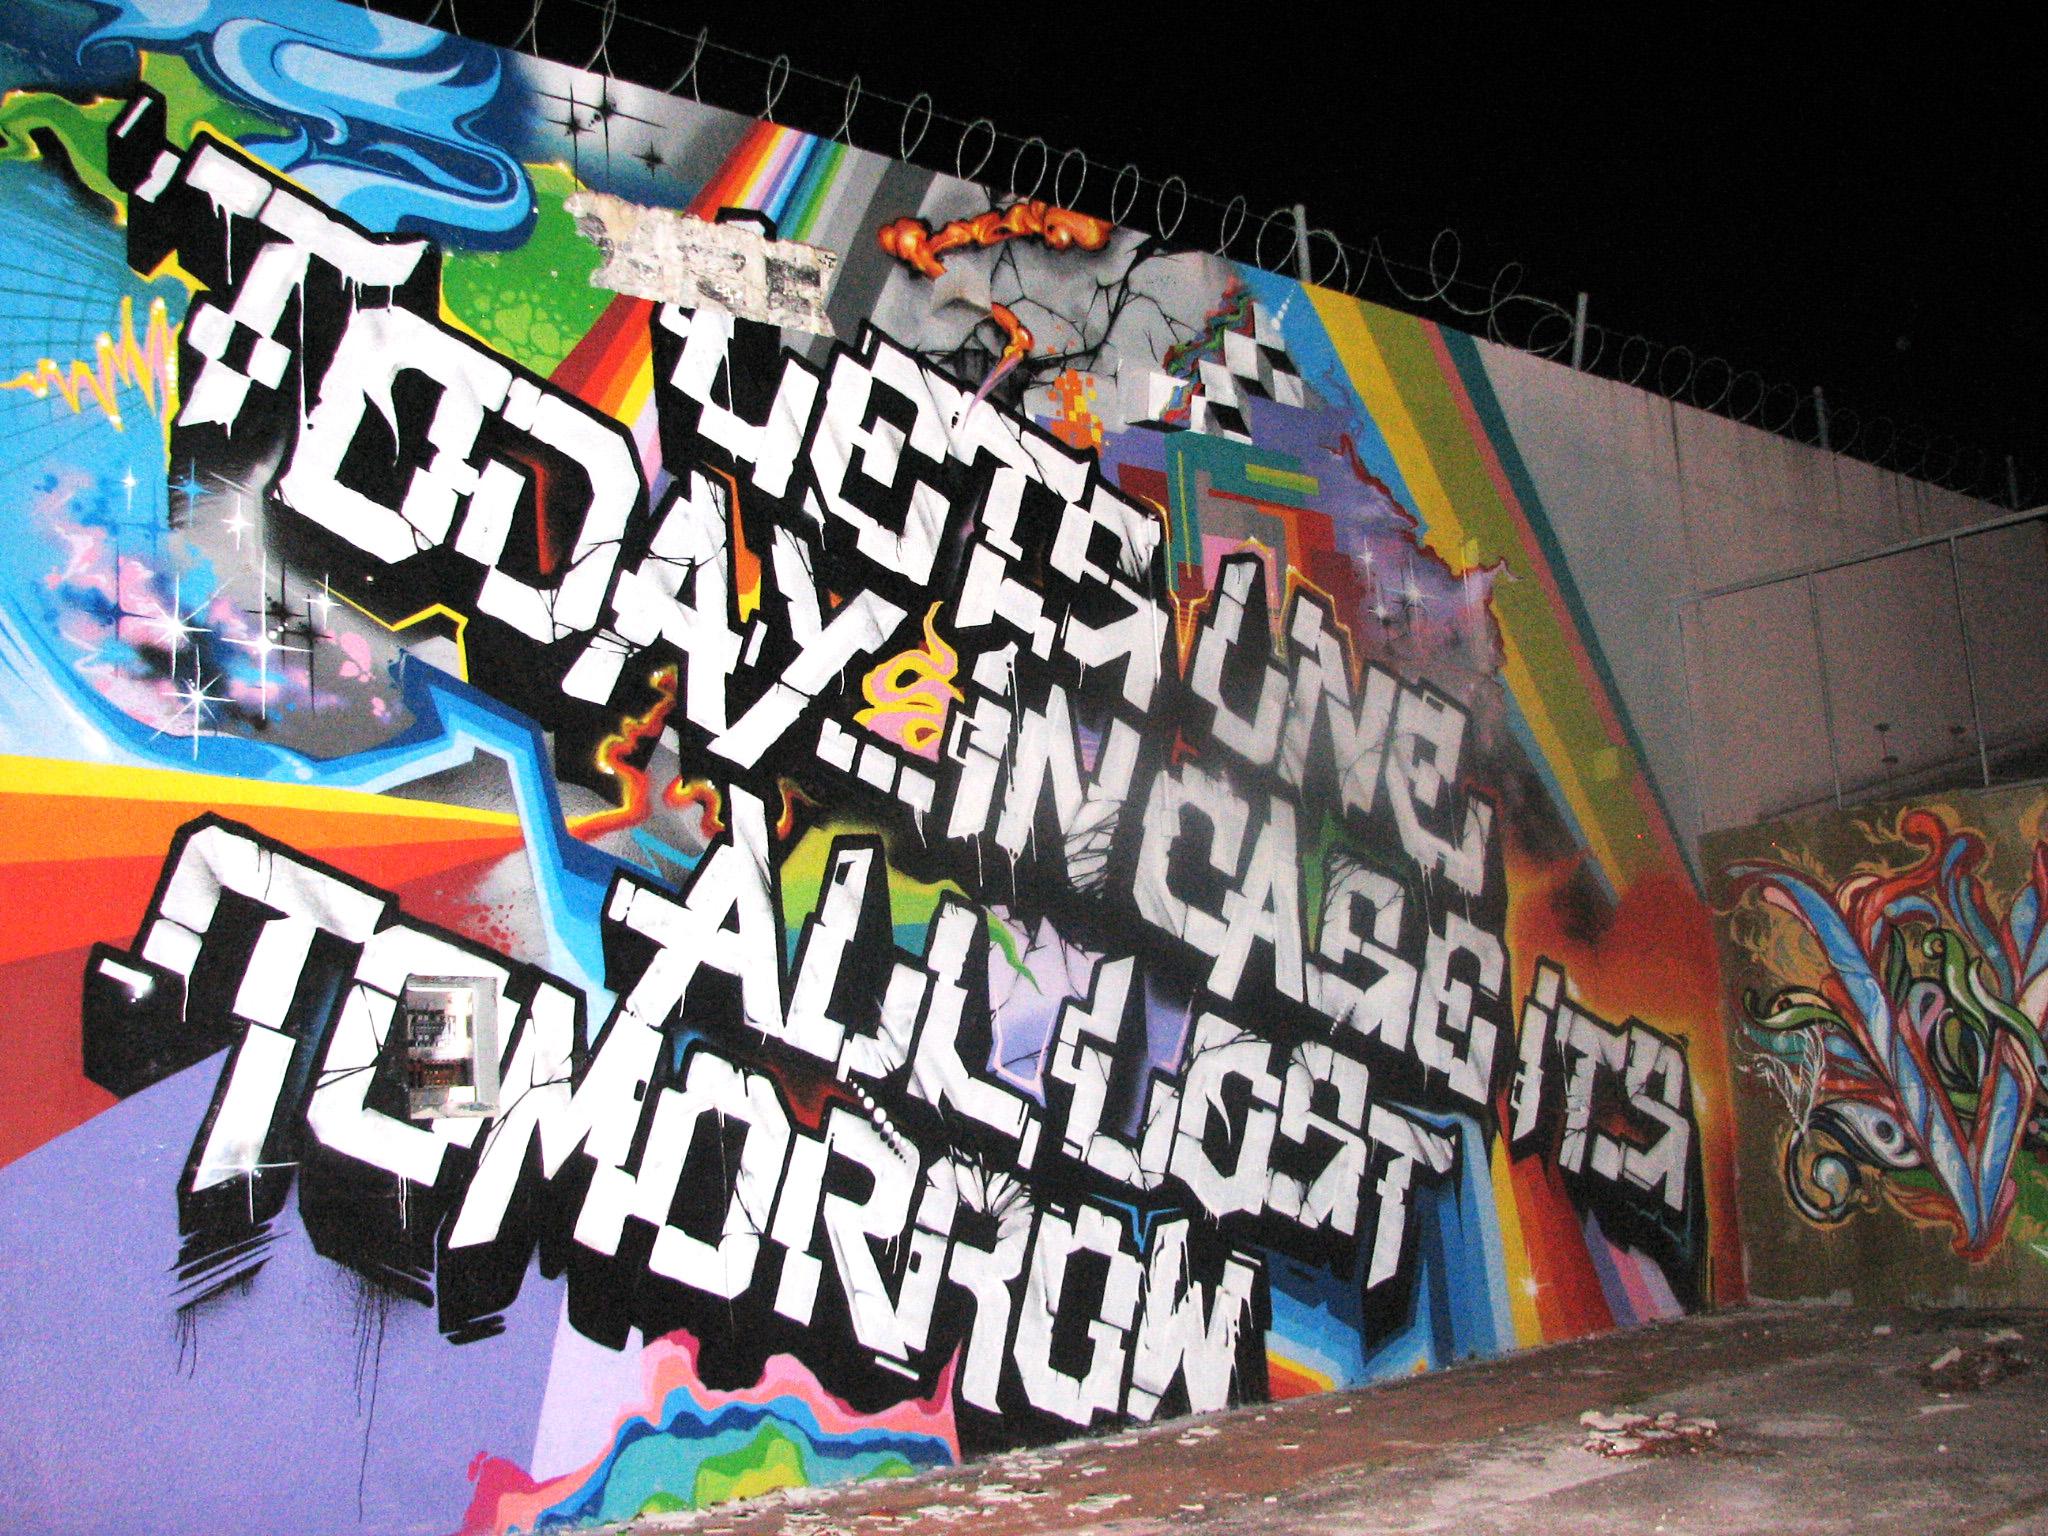 Graffiti art designs - Google Image Result For Http Artnectar Com Wp Content Uploads 2010 06 Miami_graffiti_art_2 Jpg Walls Graffiti Bluerainimages Etsy Pinterest